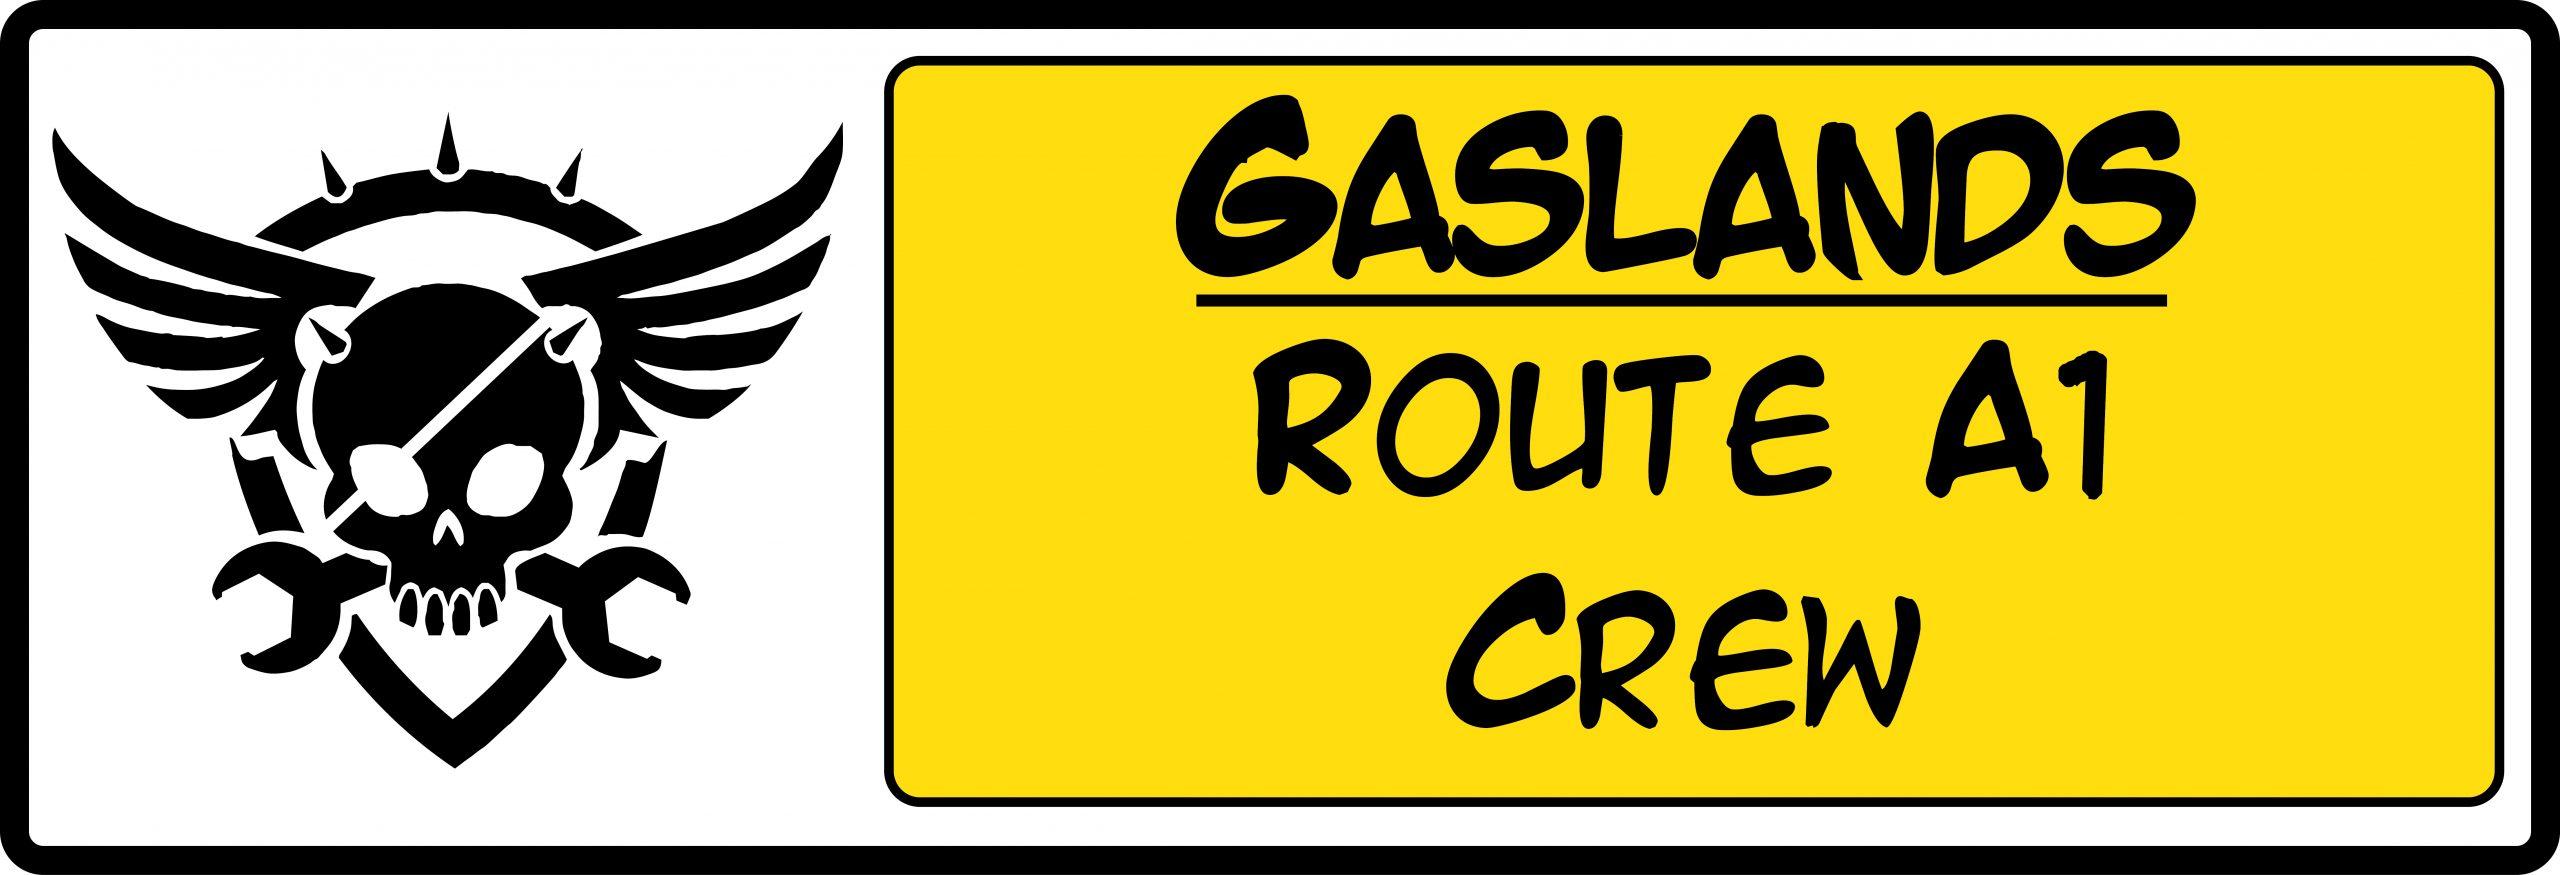 Gaslands A1 Crew